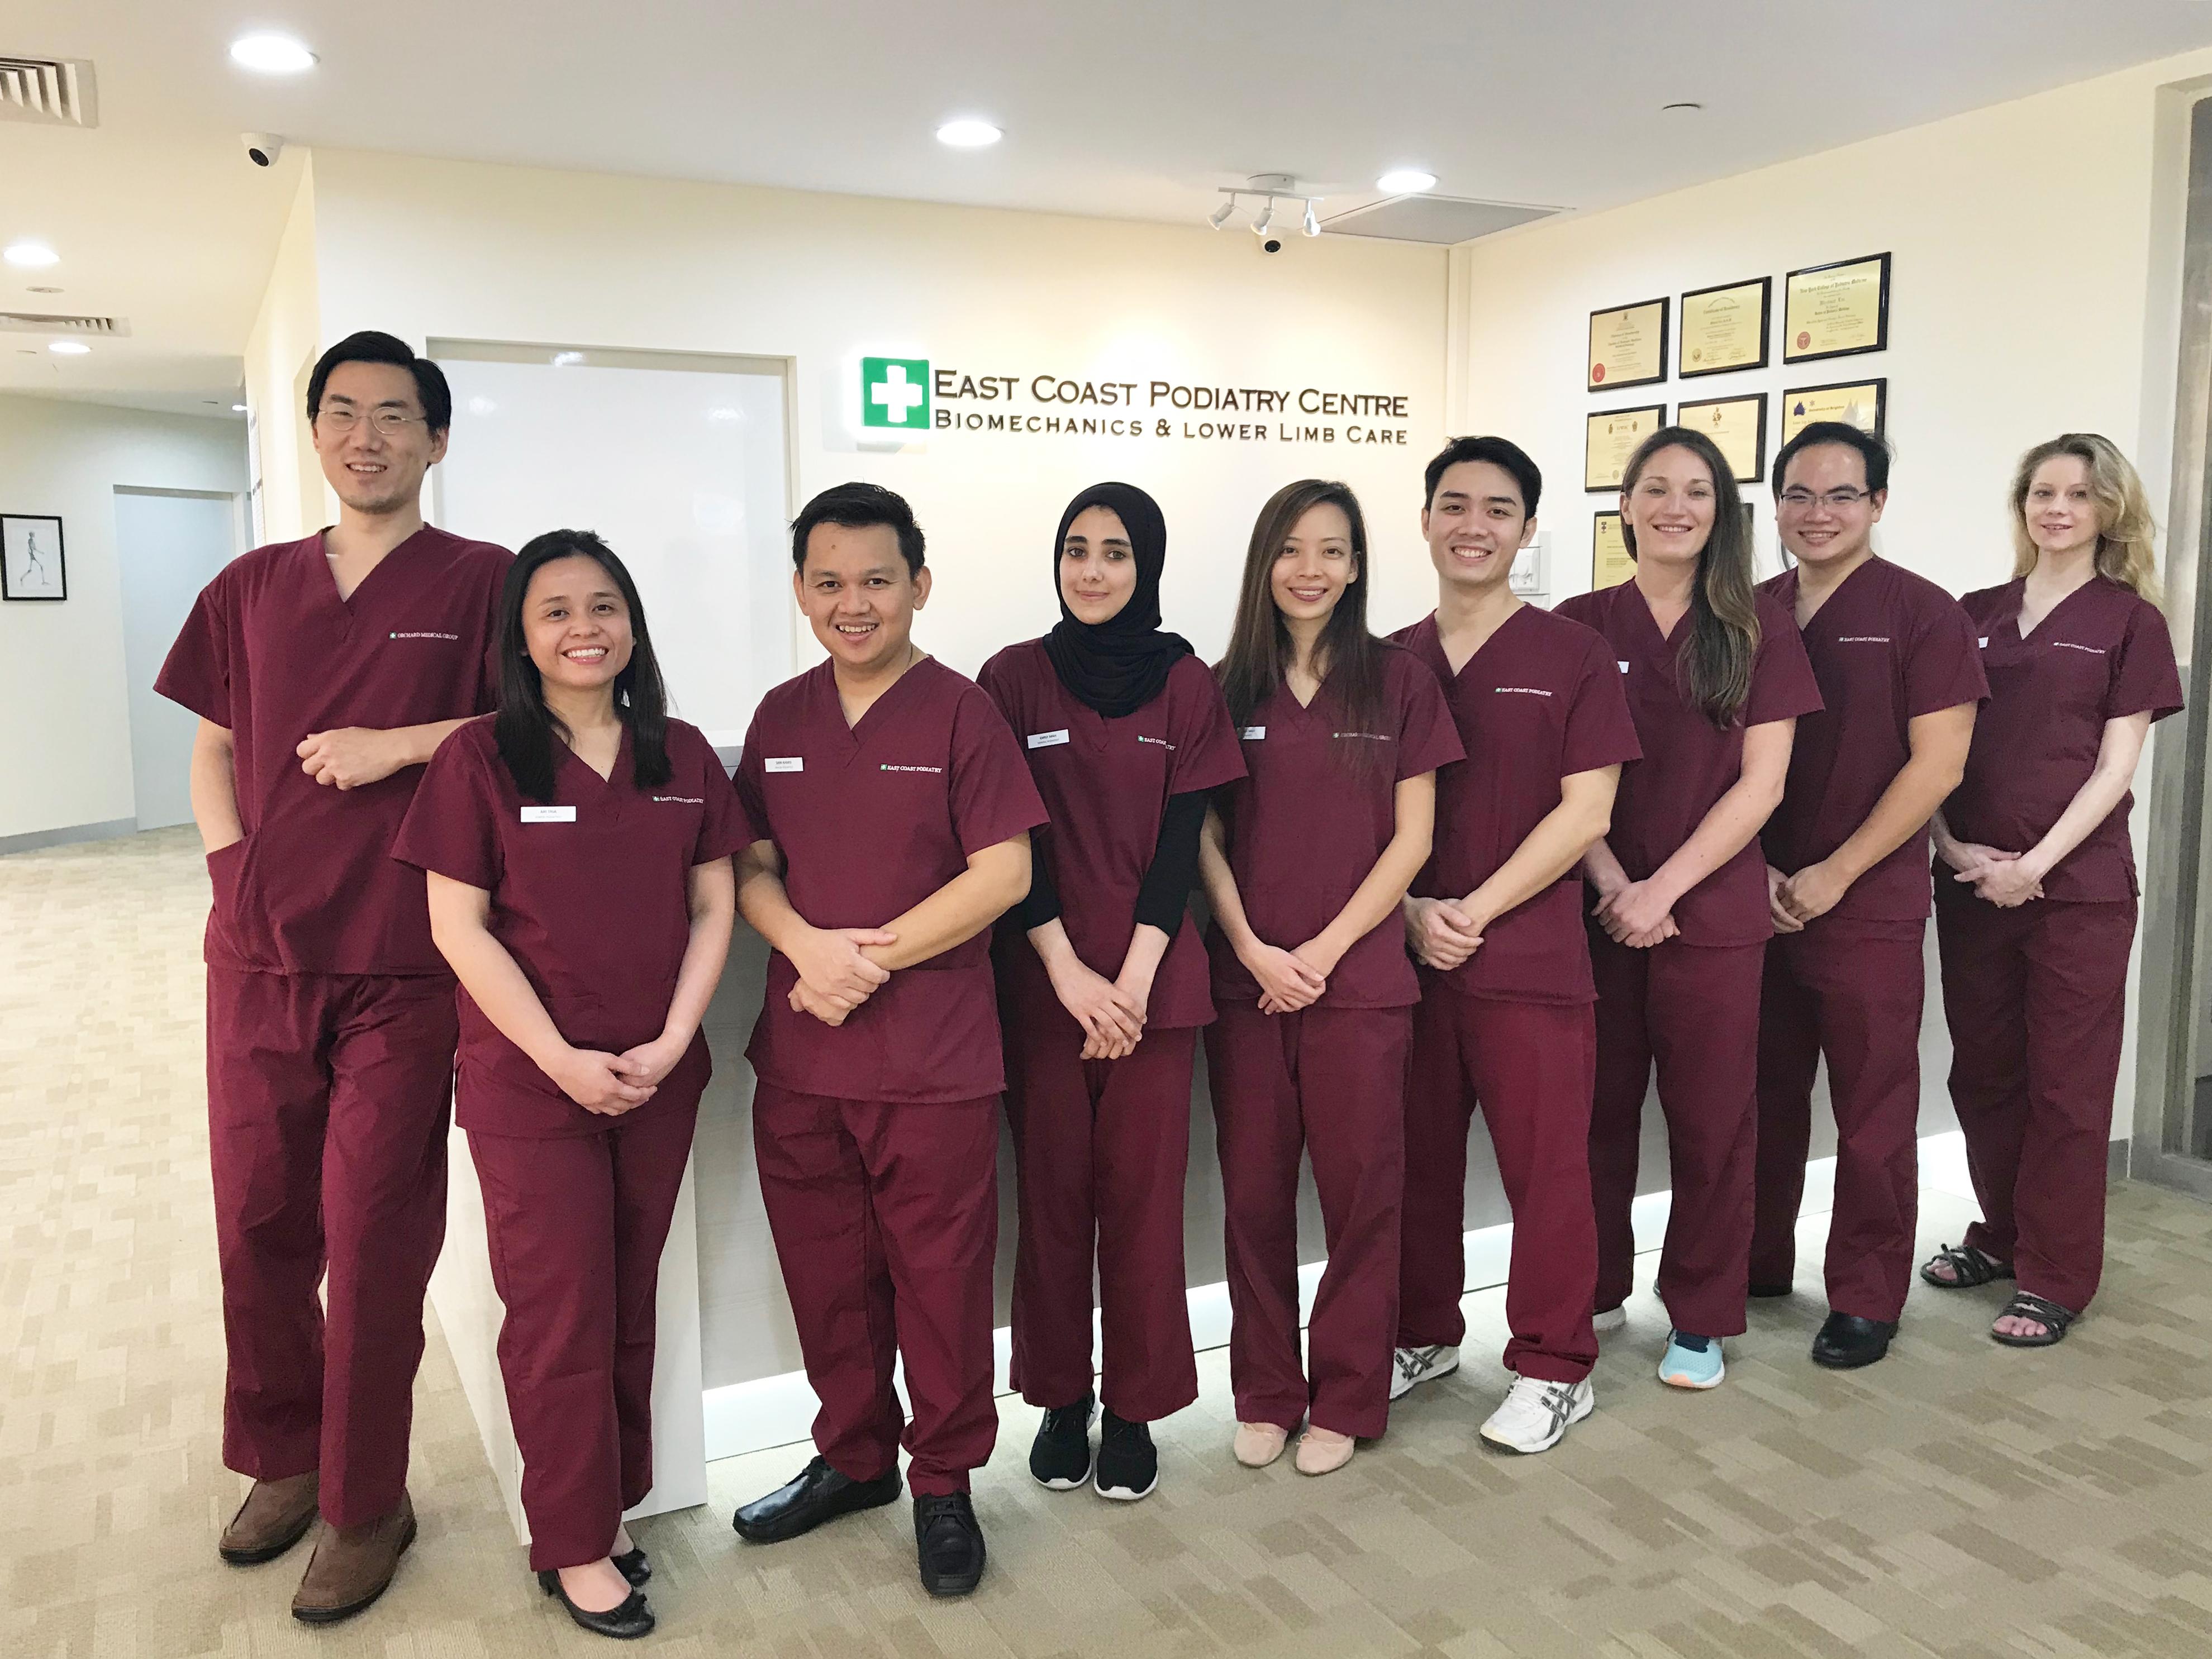 Our Podiatrists | East Coast Podiatry